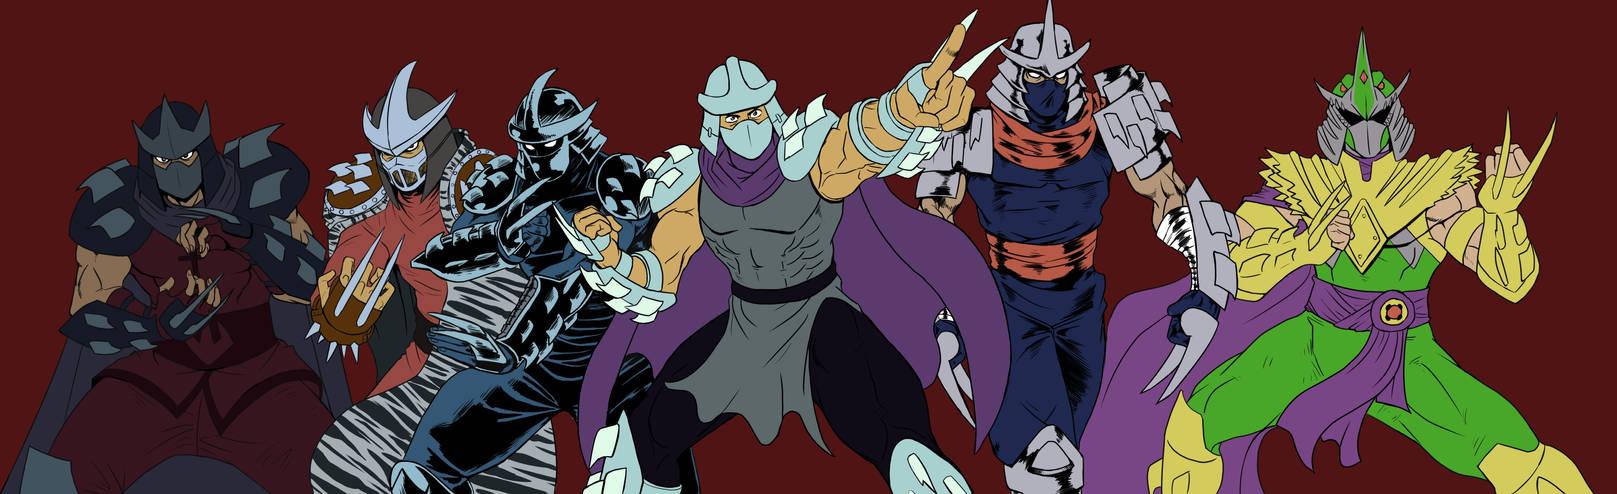 Shredders preview